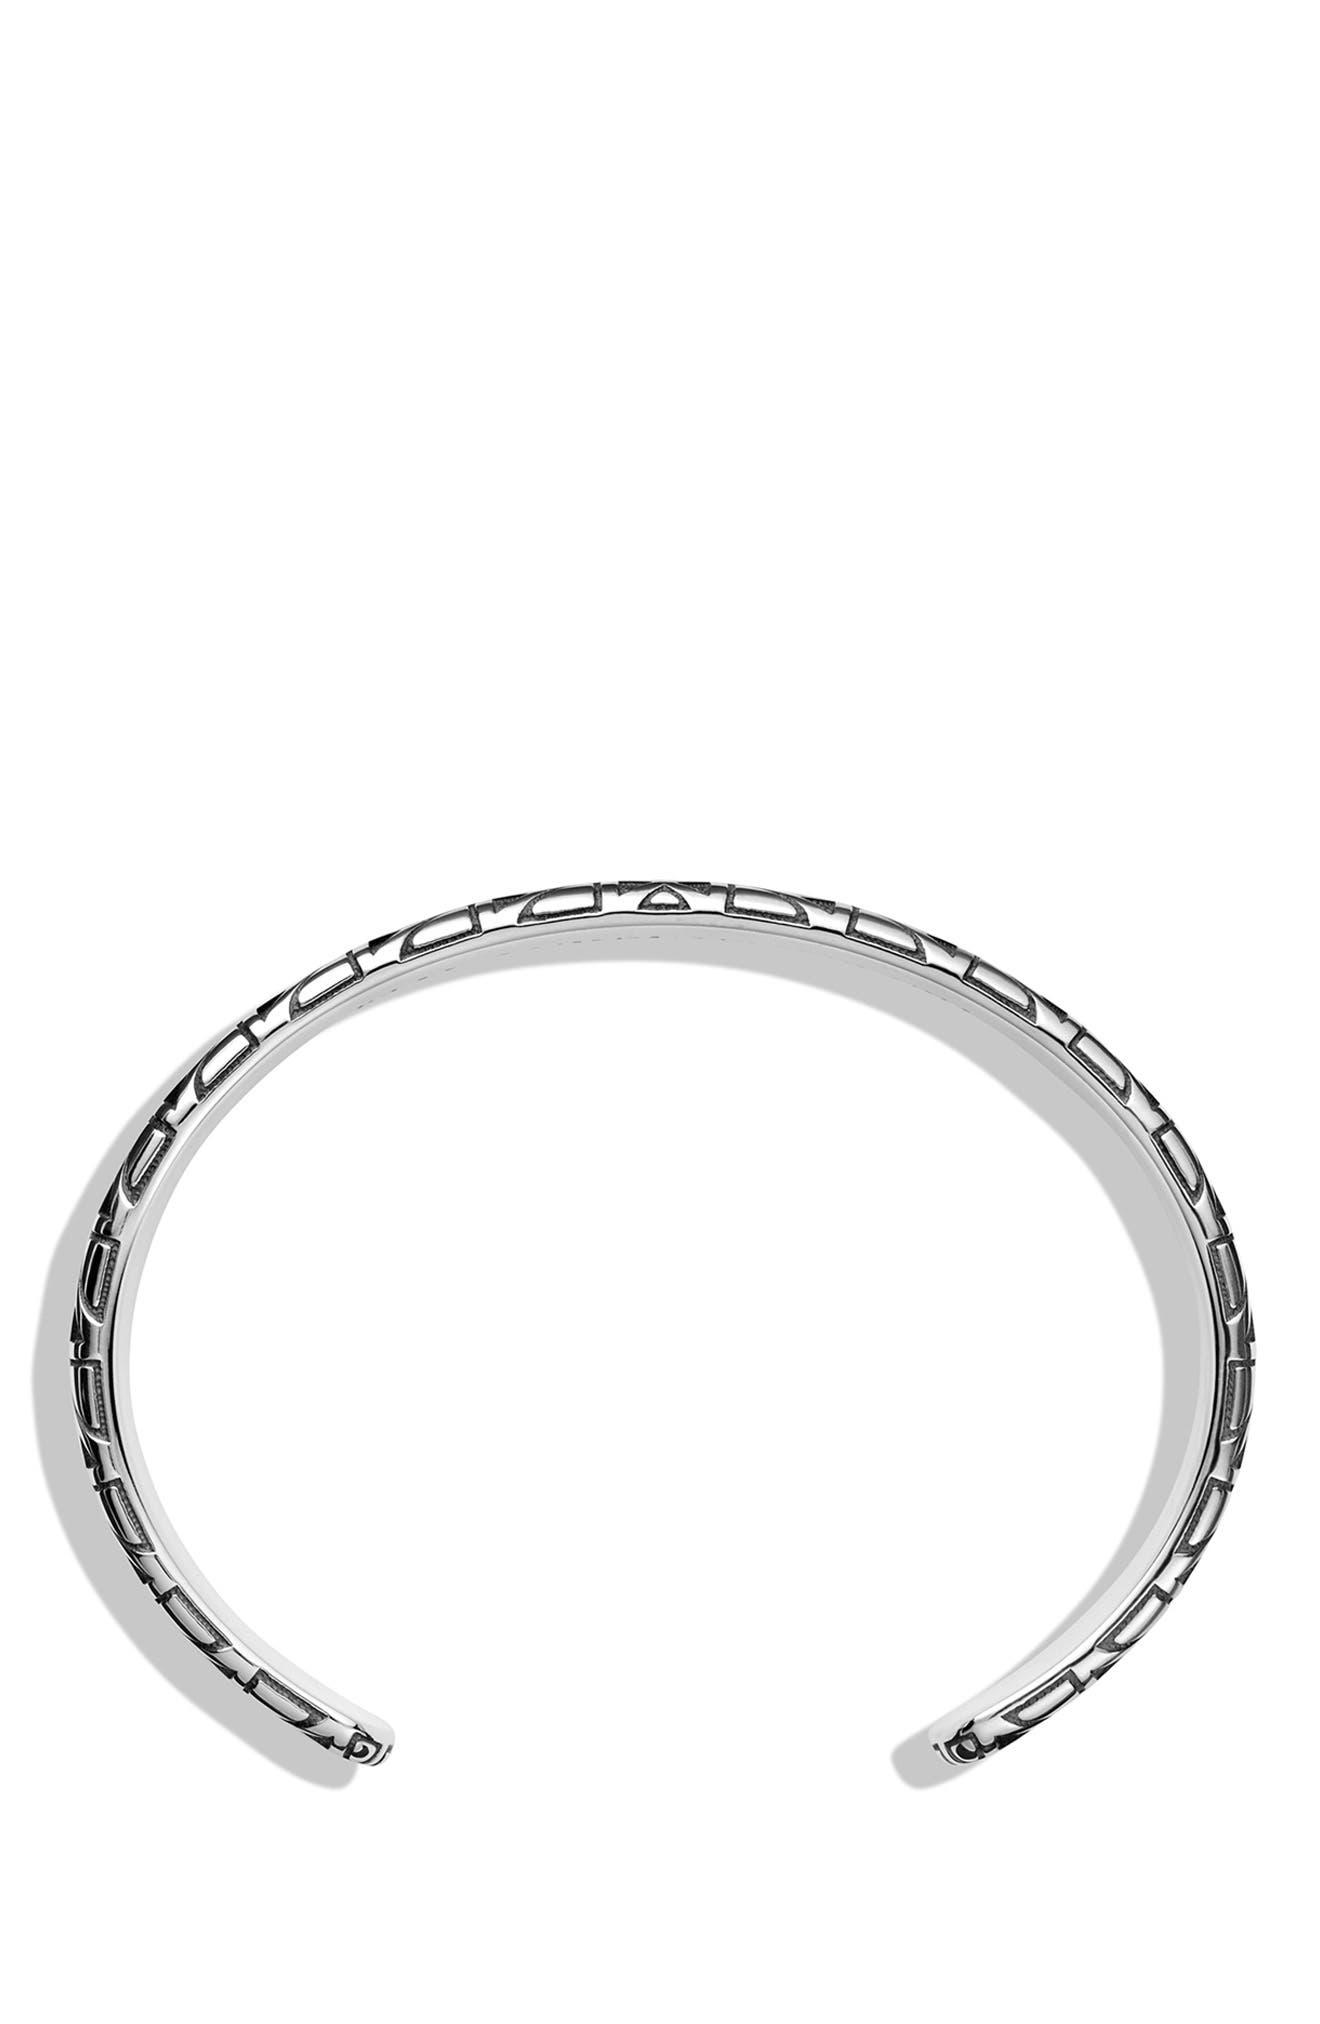 DAVID YURMAN,                             Southwest Cuff Bracelet with 18K Gold,                             Alternate thumbnail 3, color,                             040